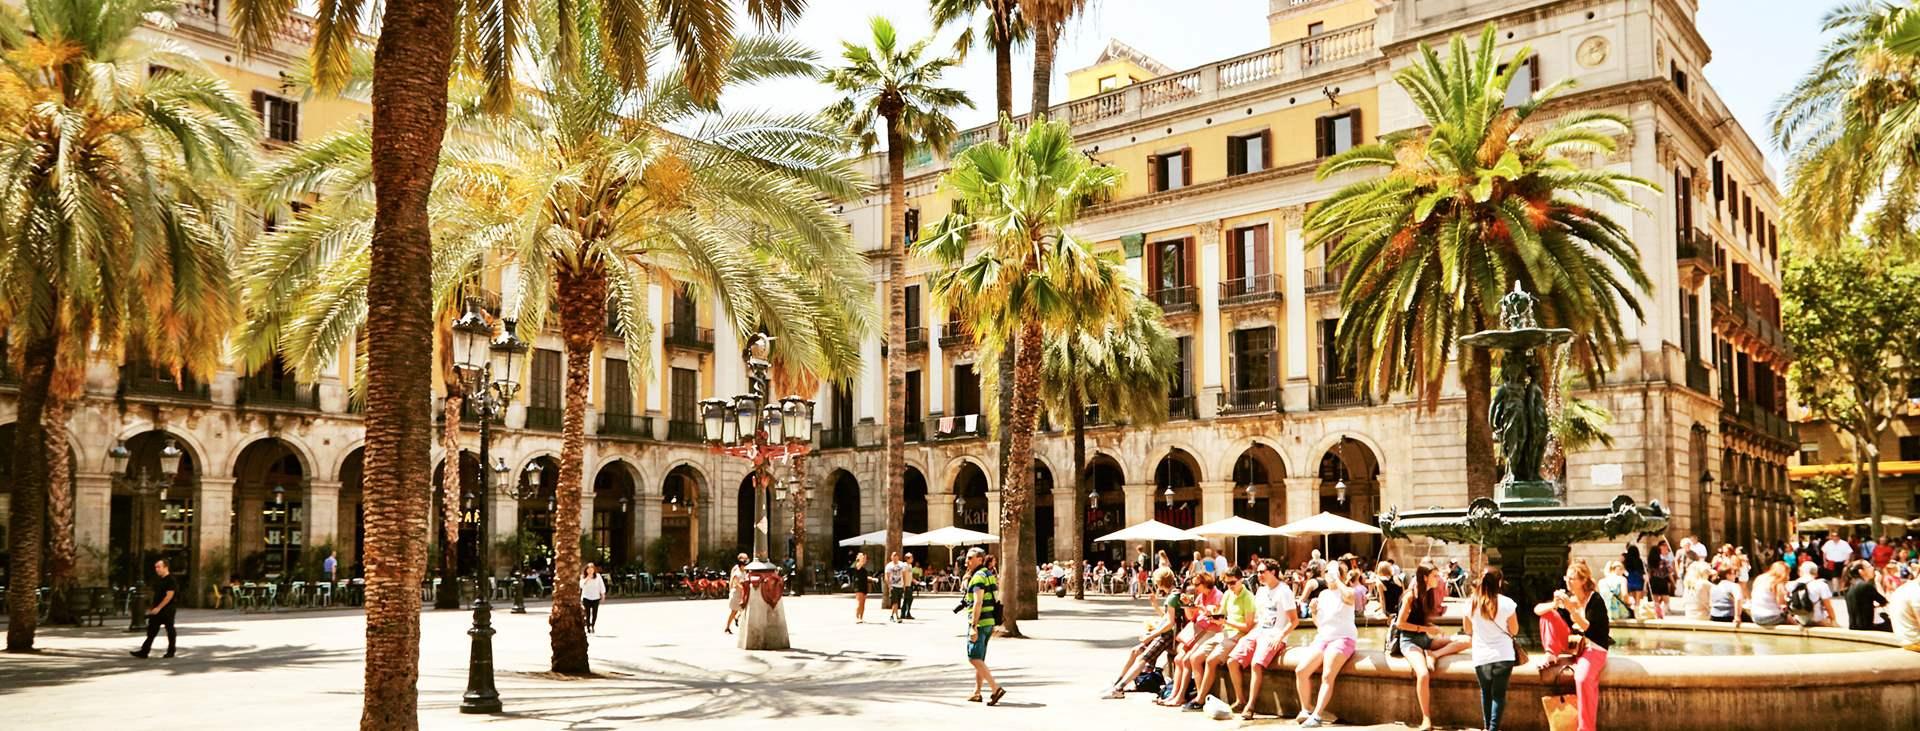 Matkat Espanja